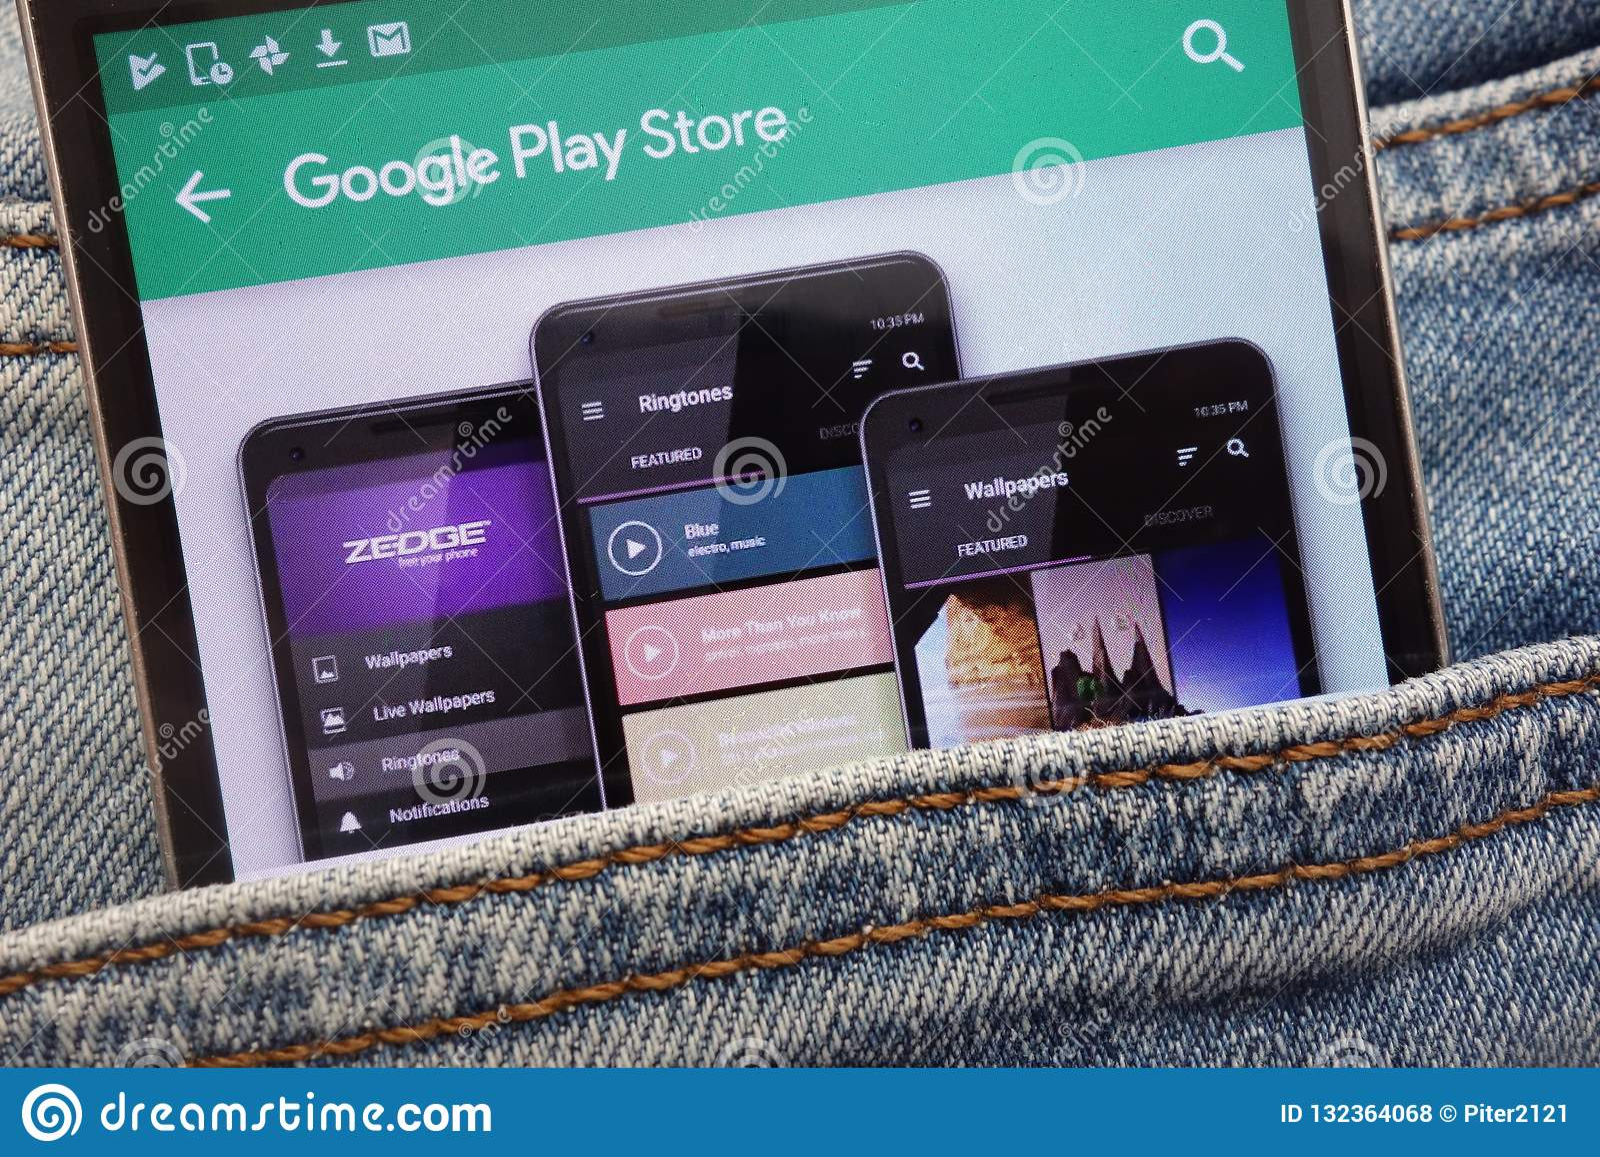 Zedge App On Google Play Store Website Displayed On ...